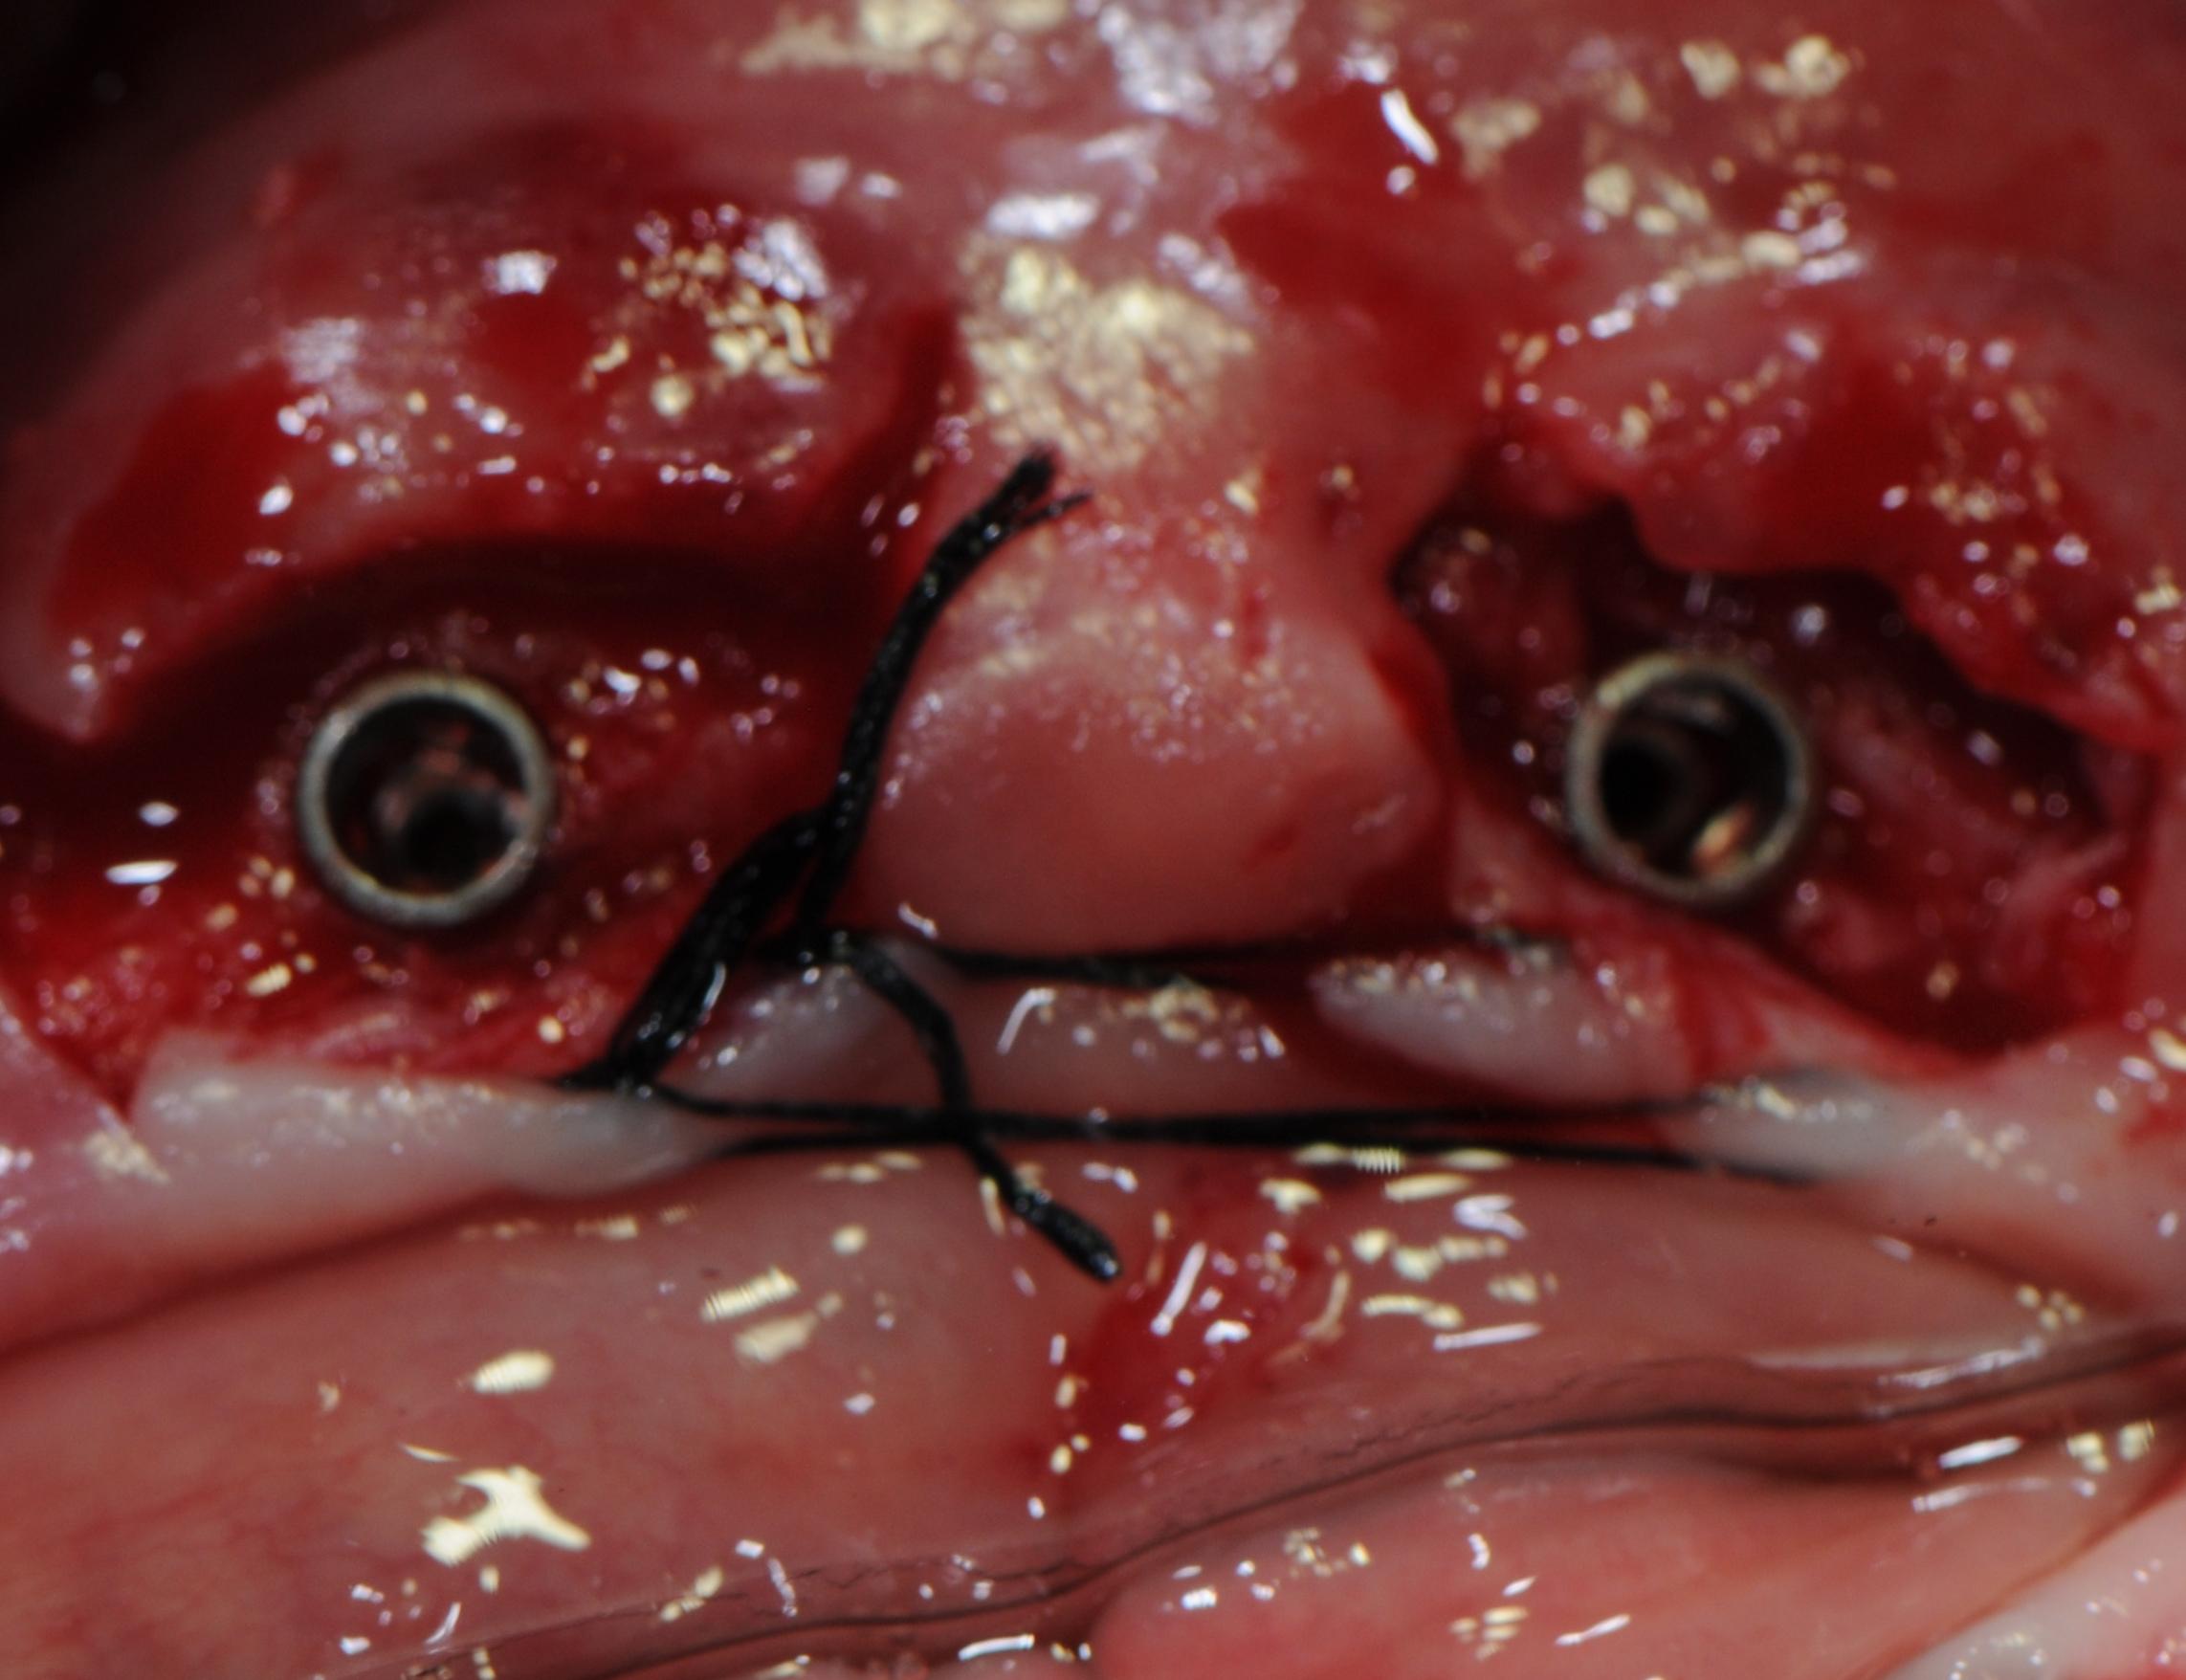 Overdenture in grossa atrofia ossea mandibolare con impianti anthogyr e locator